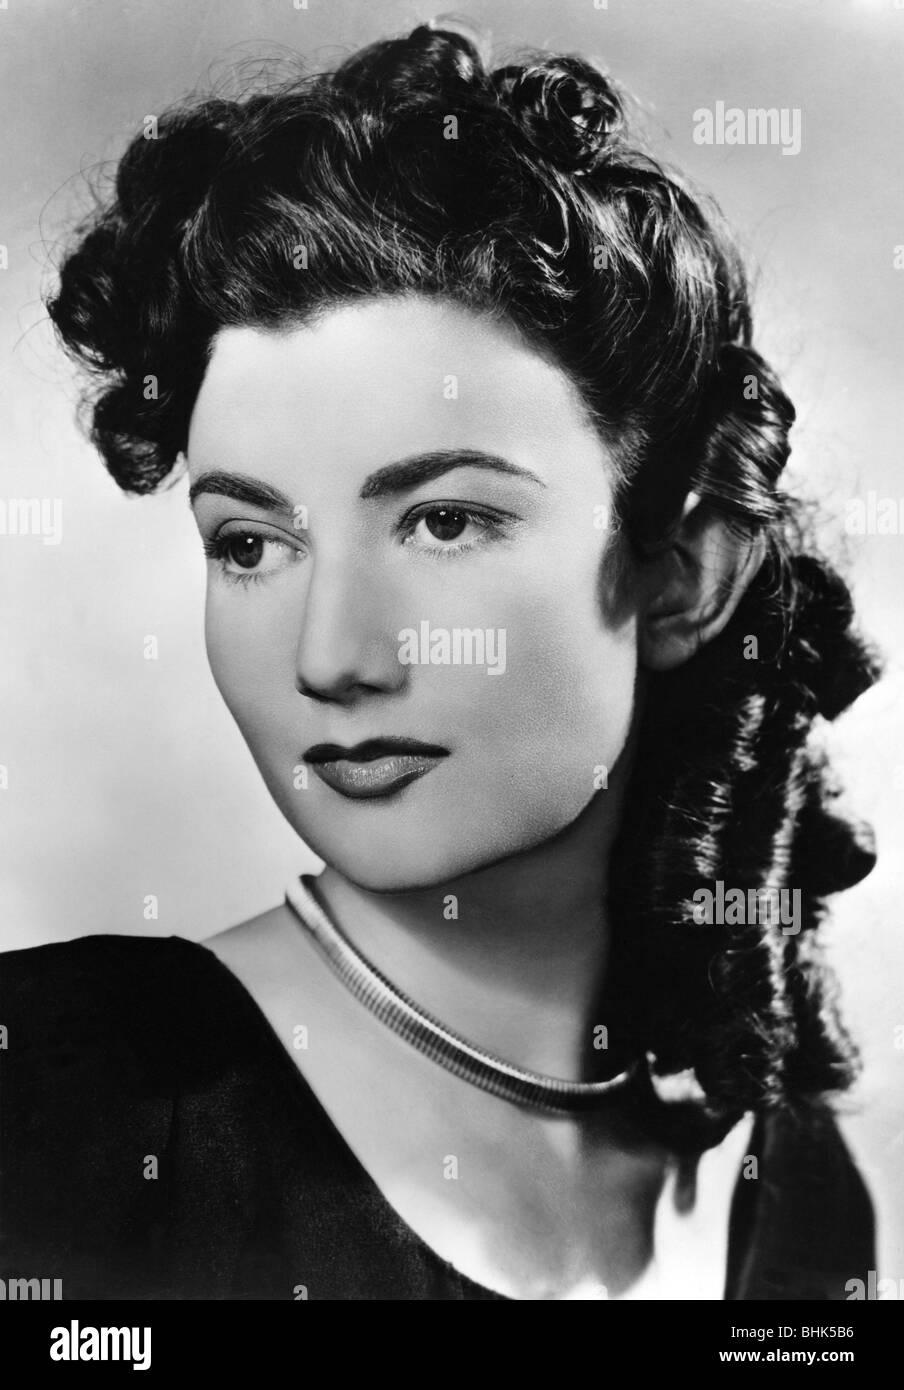 Marshall, Zena, 1.1.1925 - 10.7.2009, British actress, portrait, circa 1950s, Additional-Rights-Clearances-NA - Stock Image